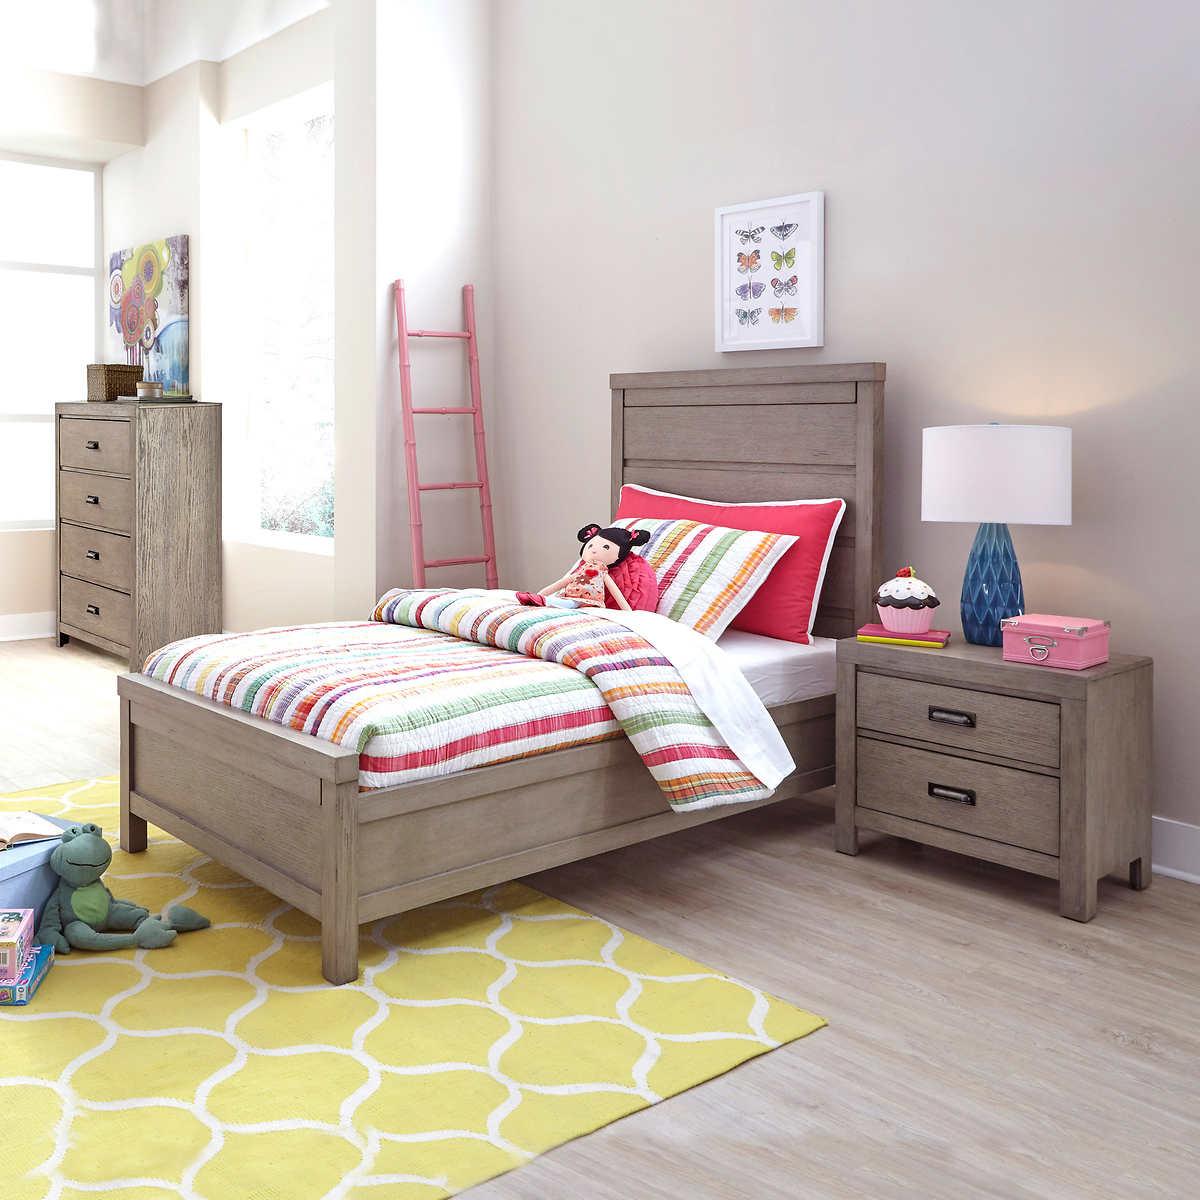 Brynlee 9-piece Twin Bedroom Set with Dresser